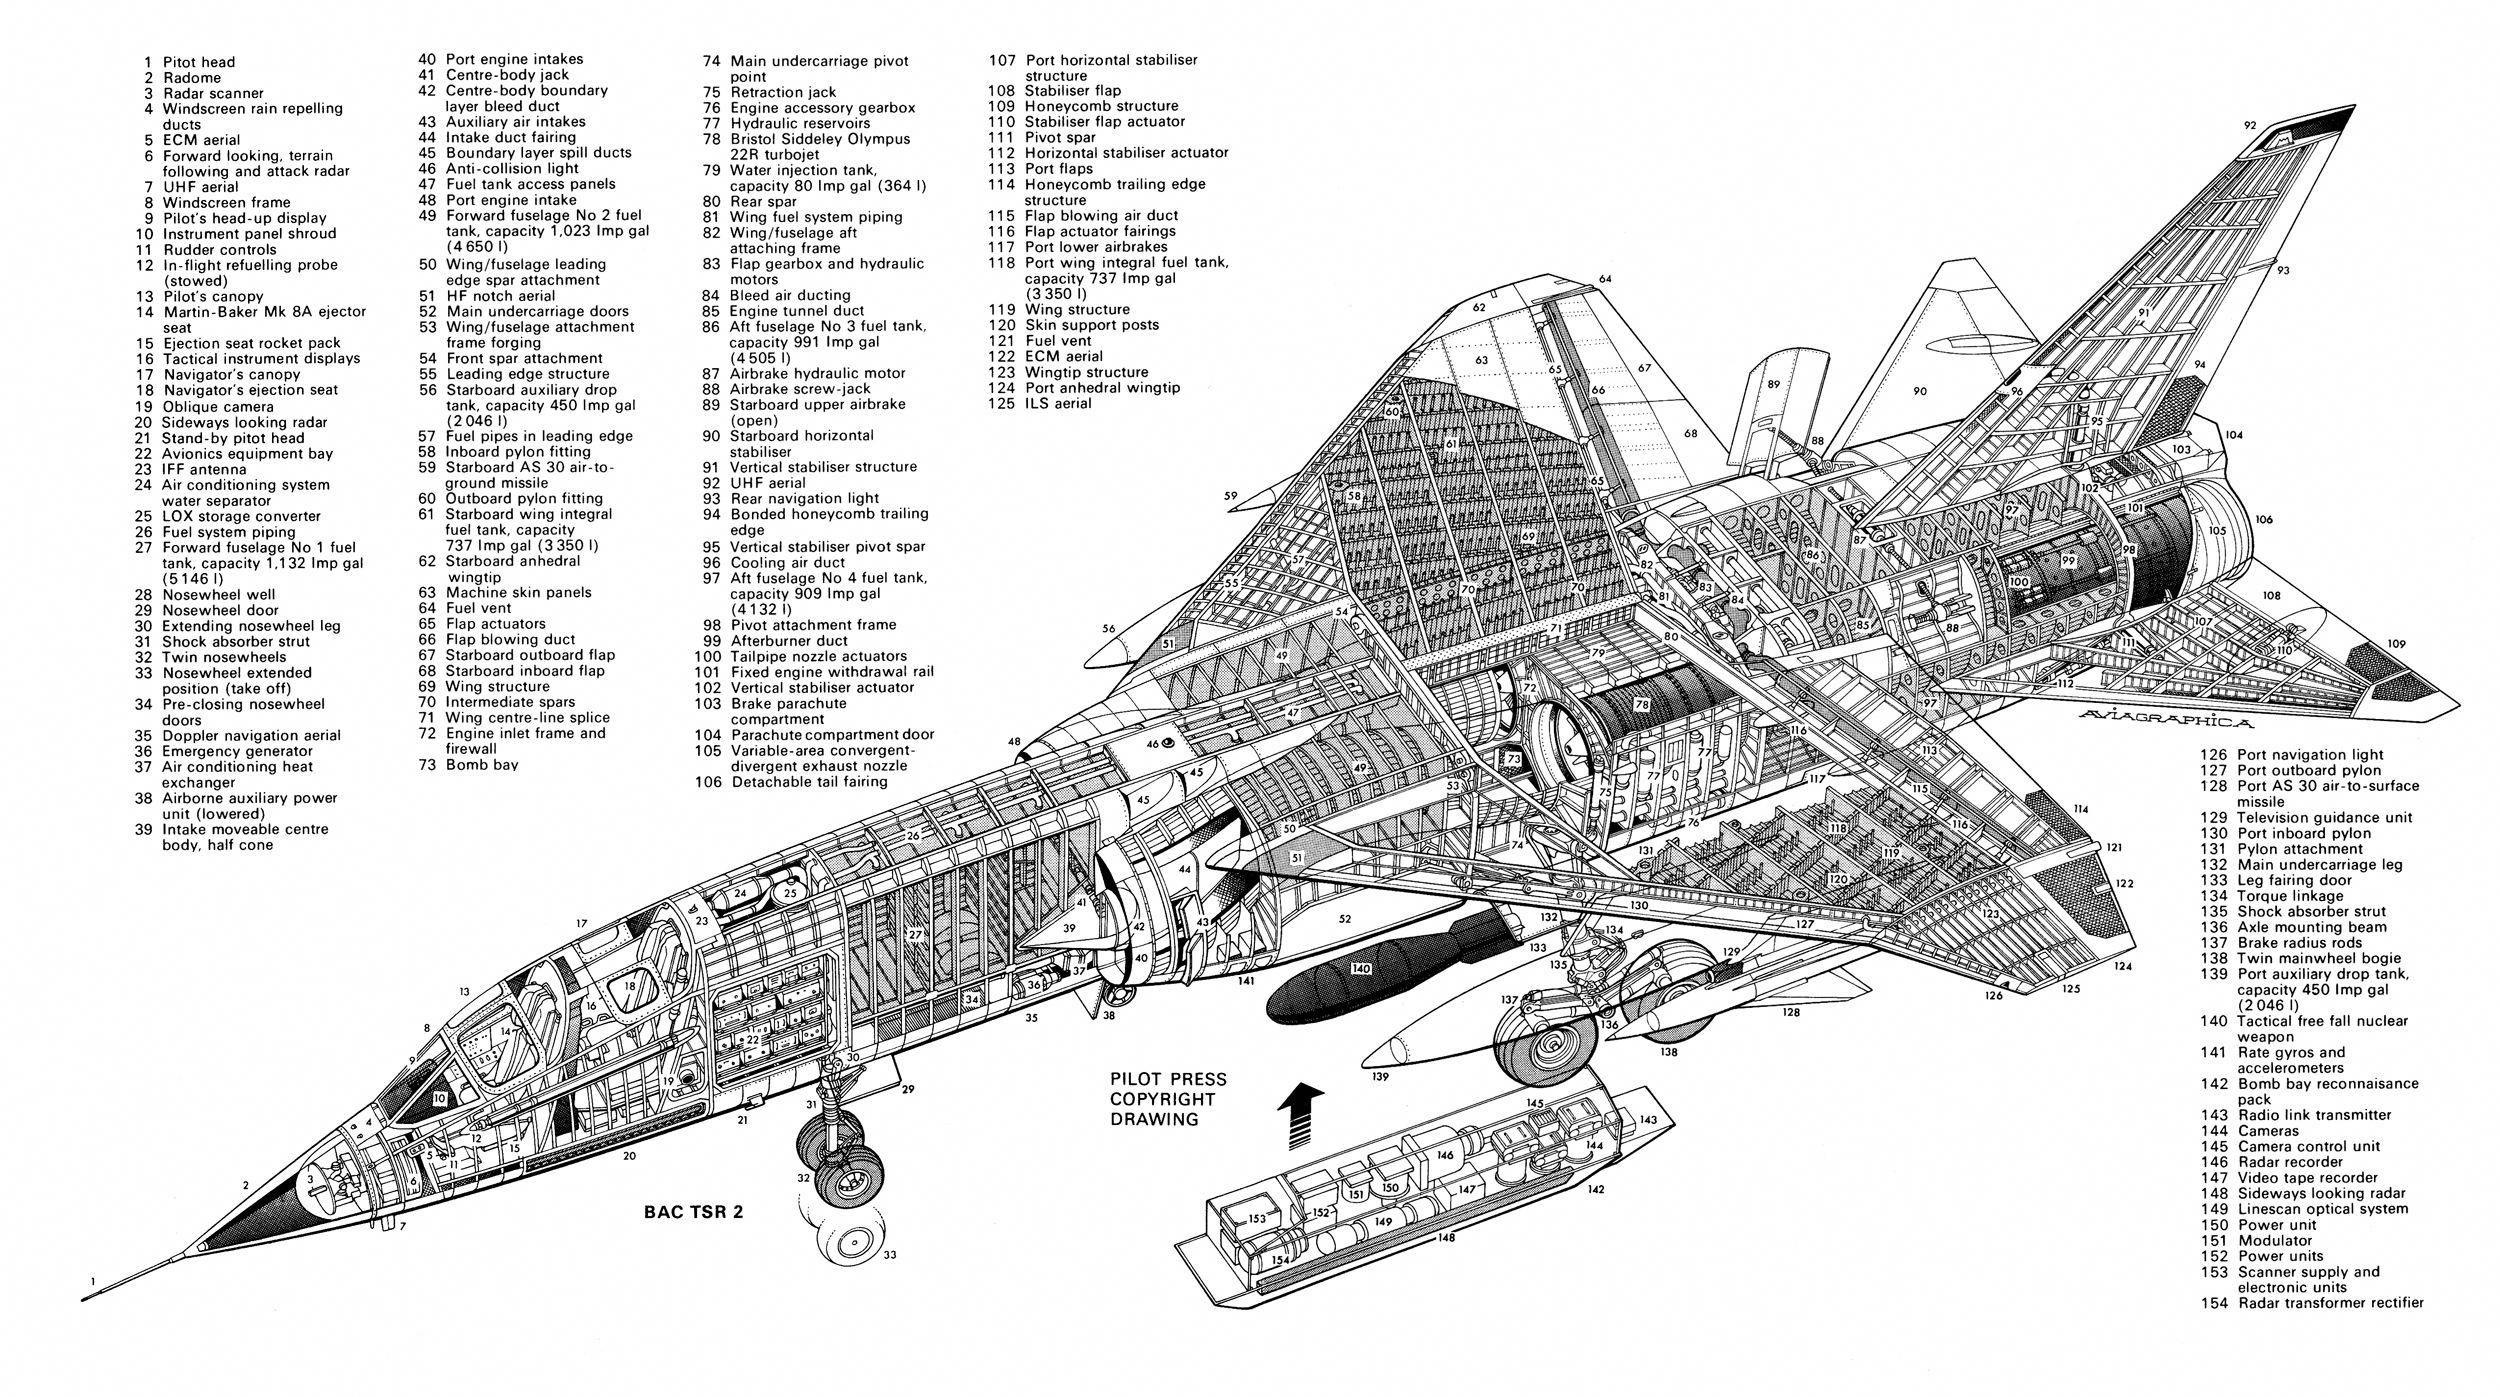 British Aircraft Corporation Tsr 2 Modeltrainbushes